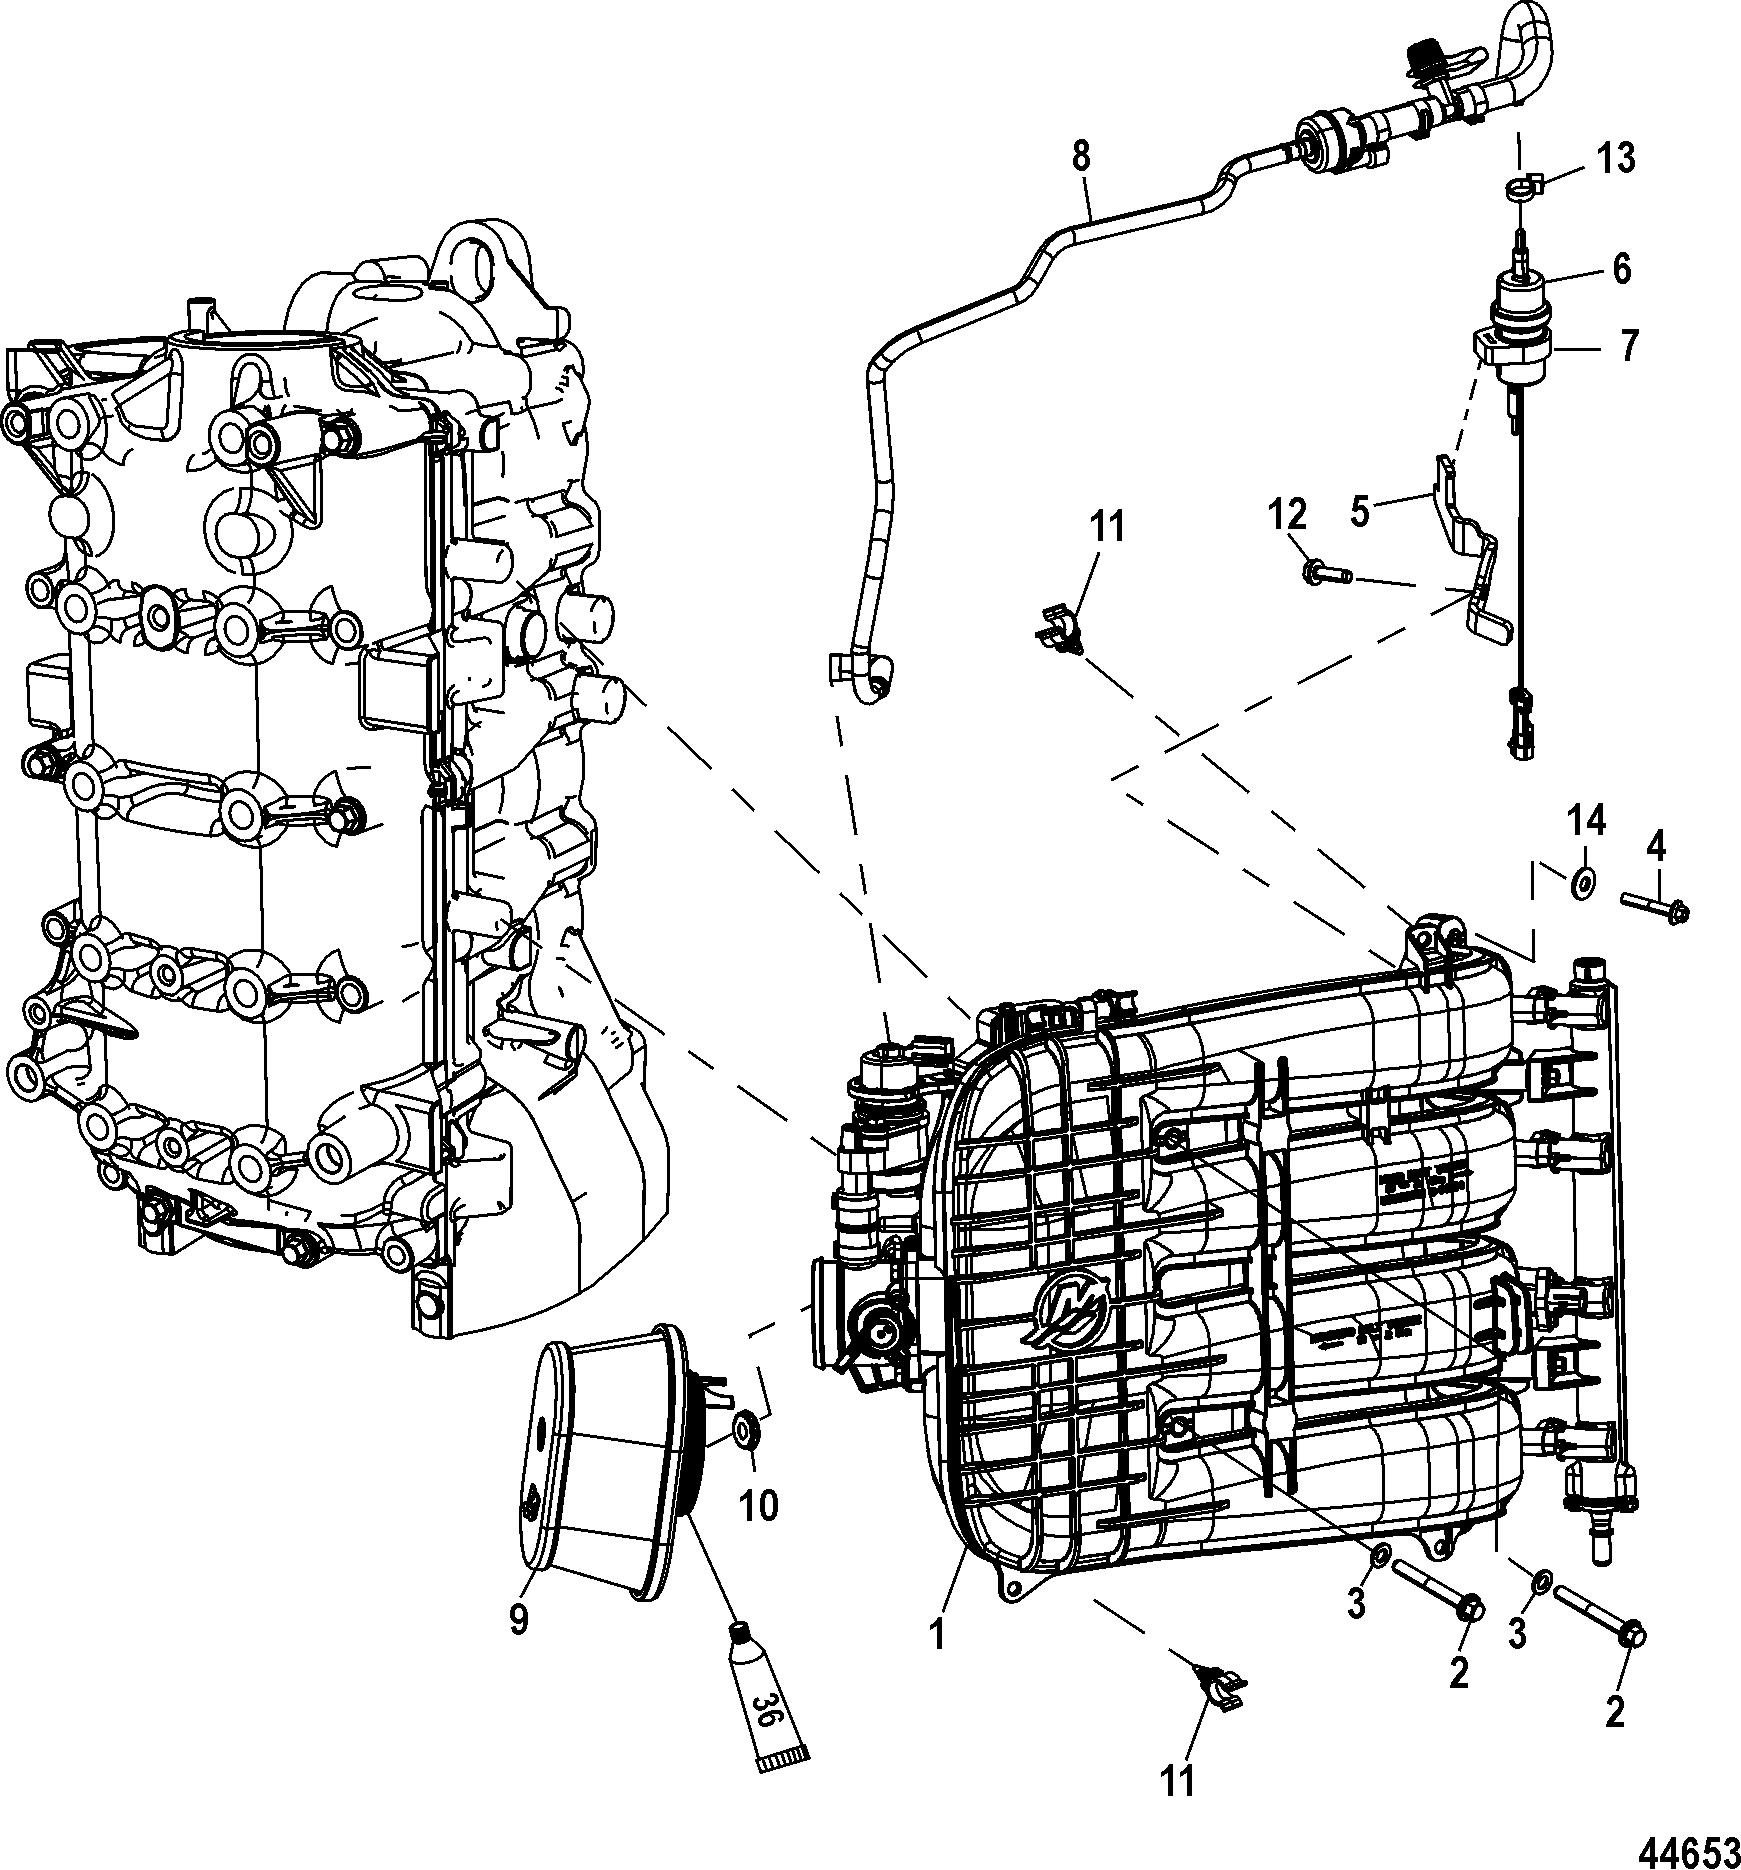 Integrated Air Fuel Module For Mariner Mercury 75 80 90